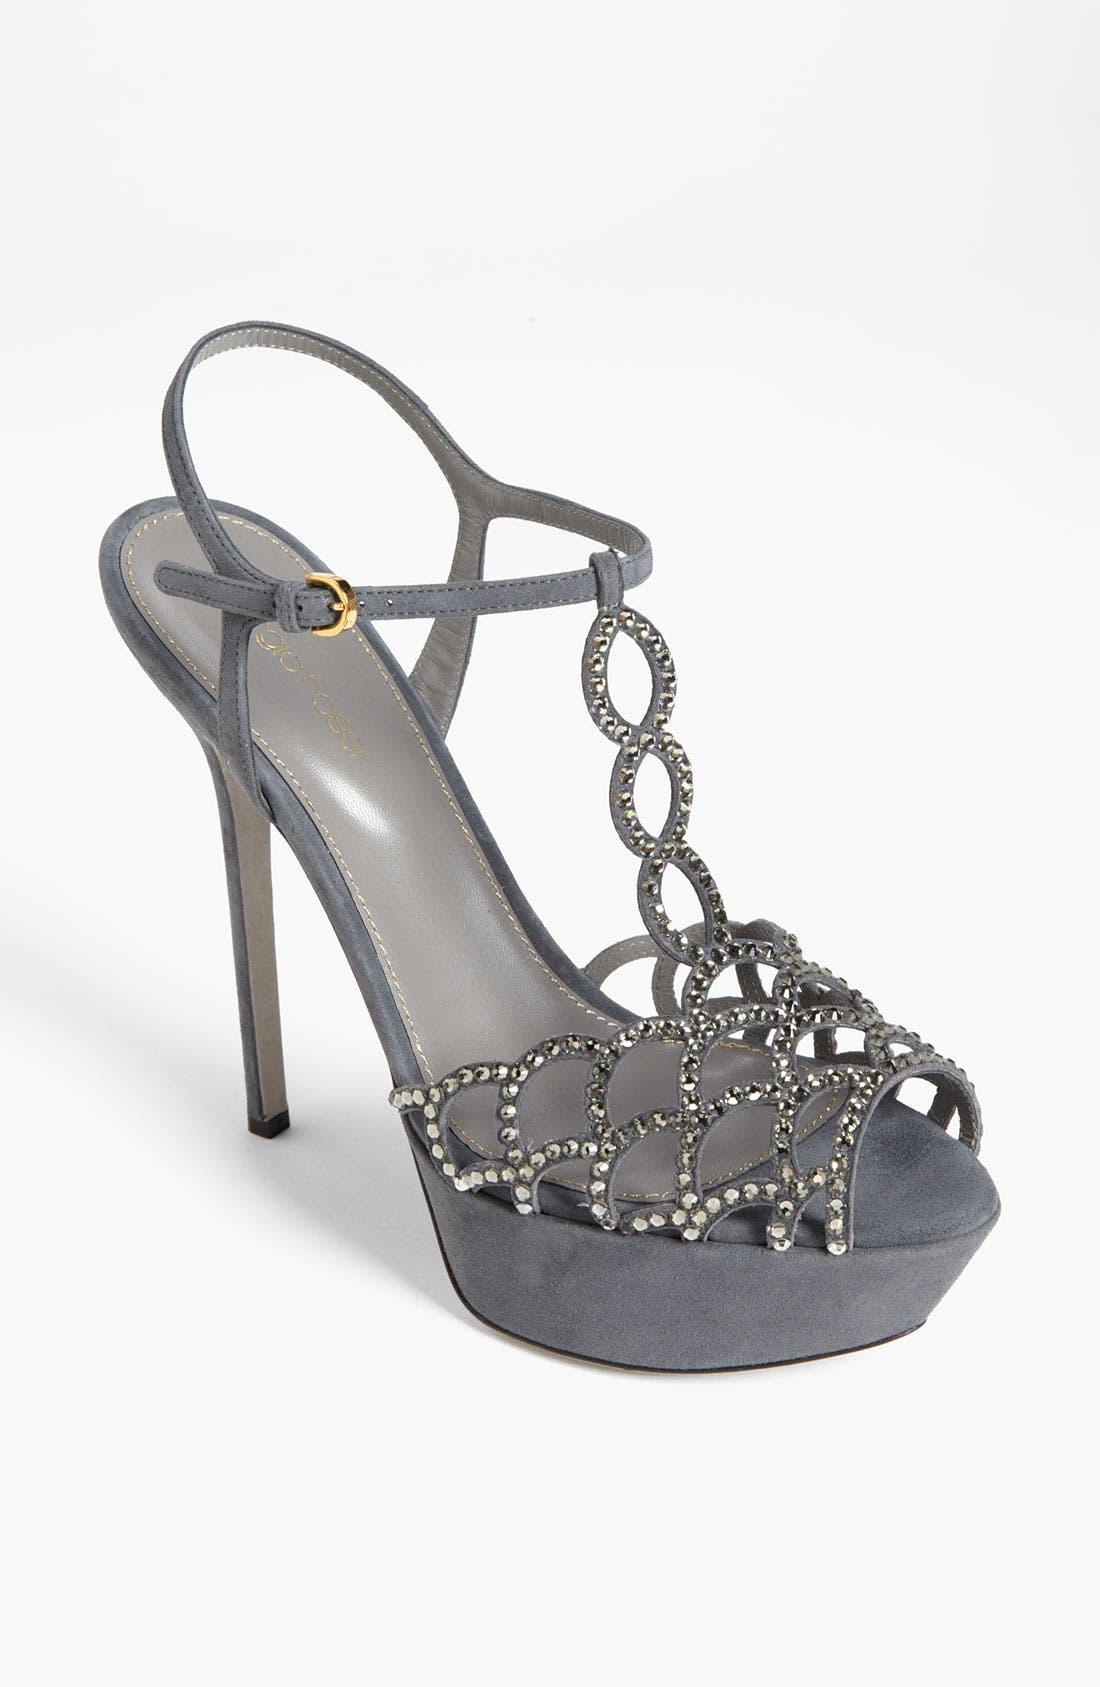 Alternate Image 1 Selected - Sergio Rossi 'Vague' Platform Sandal